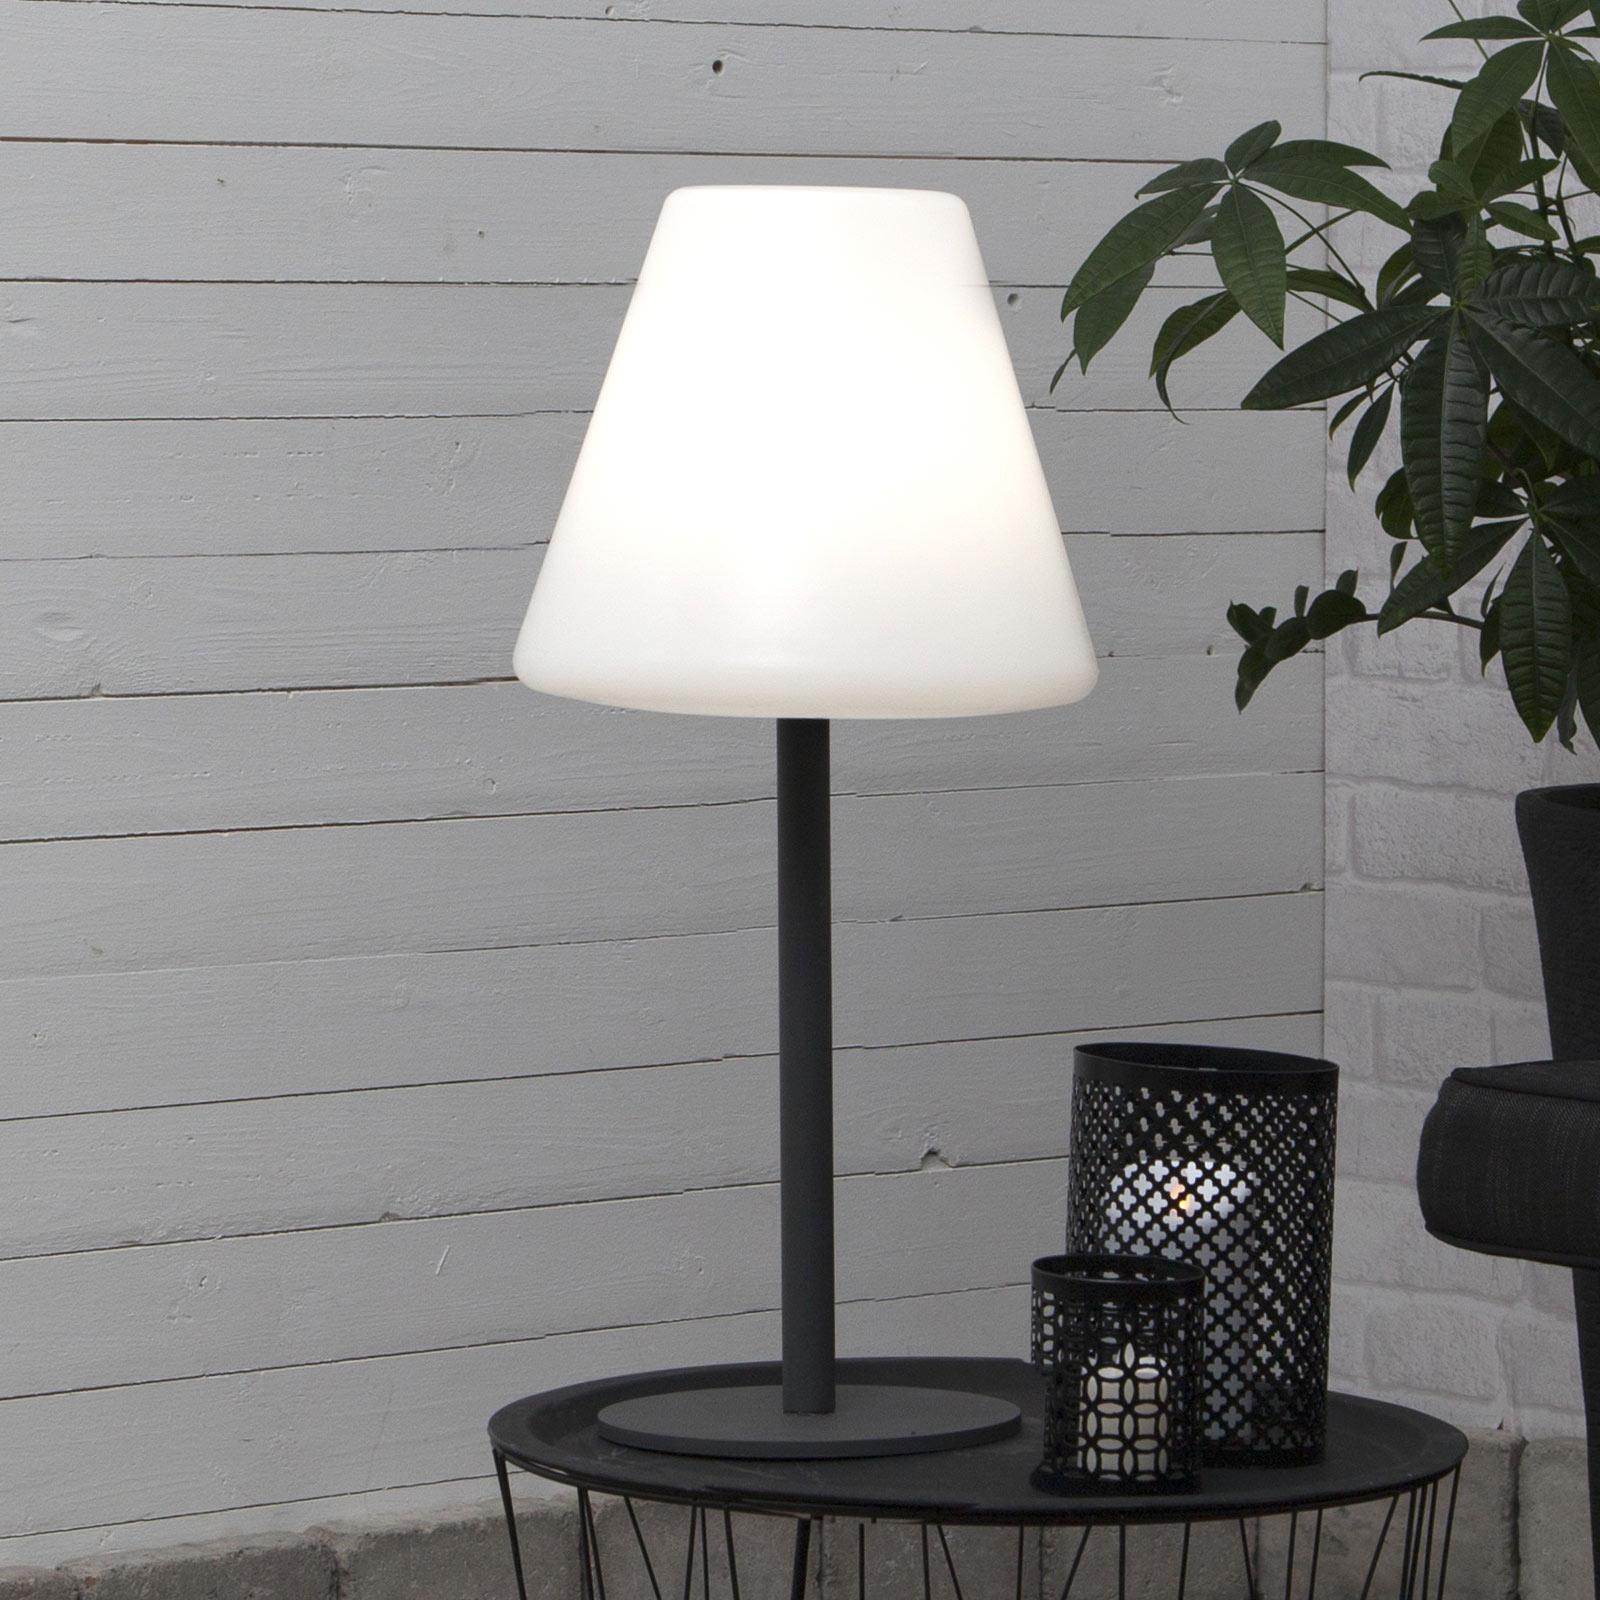 Lampa tarasowa Gardenlight, 60 cm